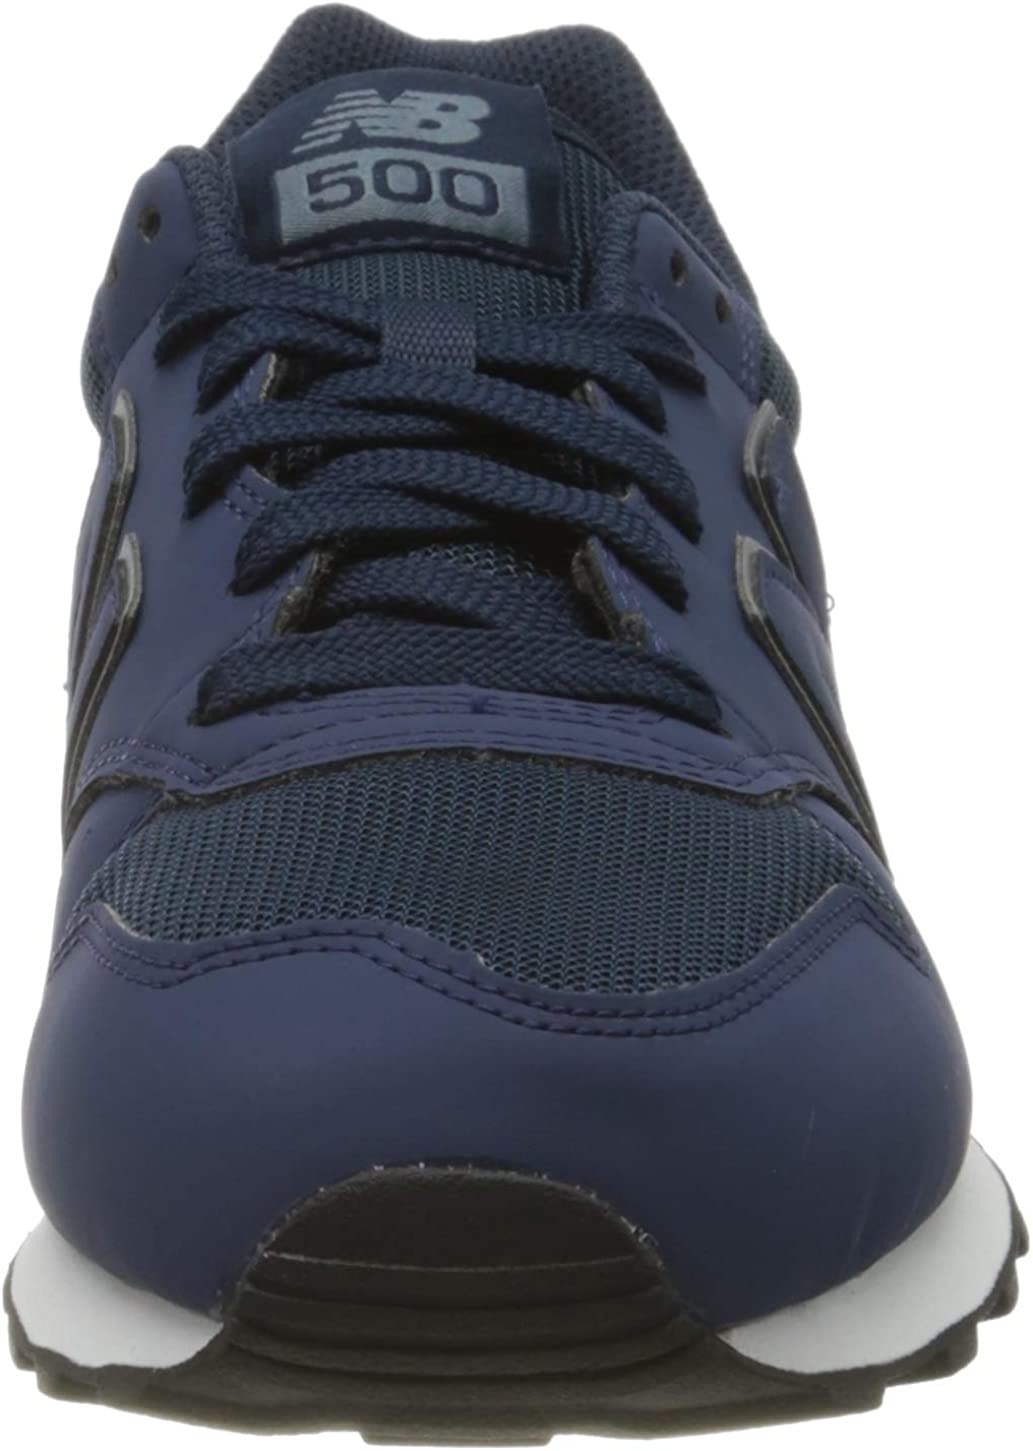 Amazon.com: New Balance 500 Blue Sneaker For Men GM500TRZ ...